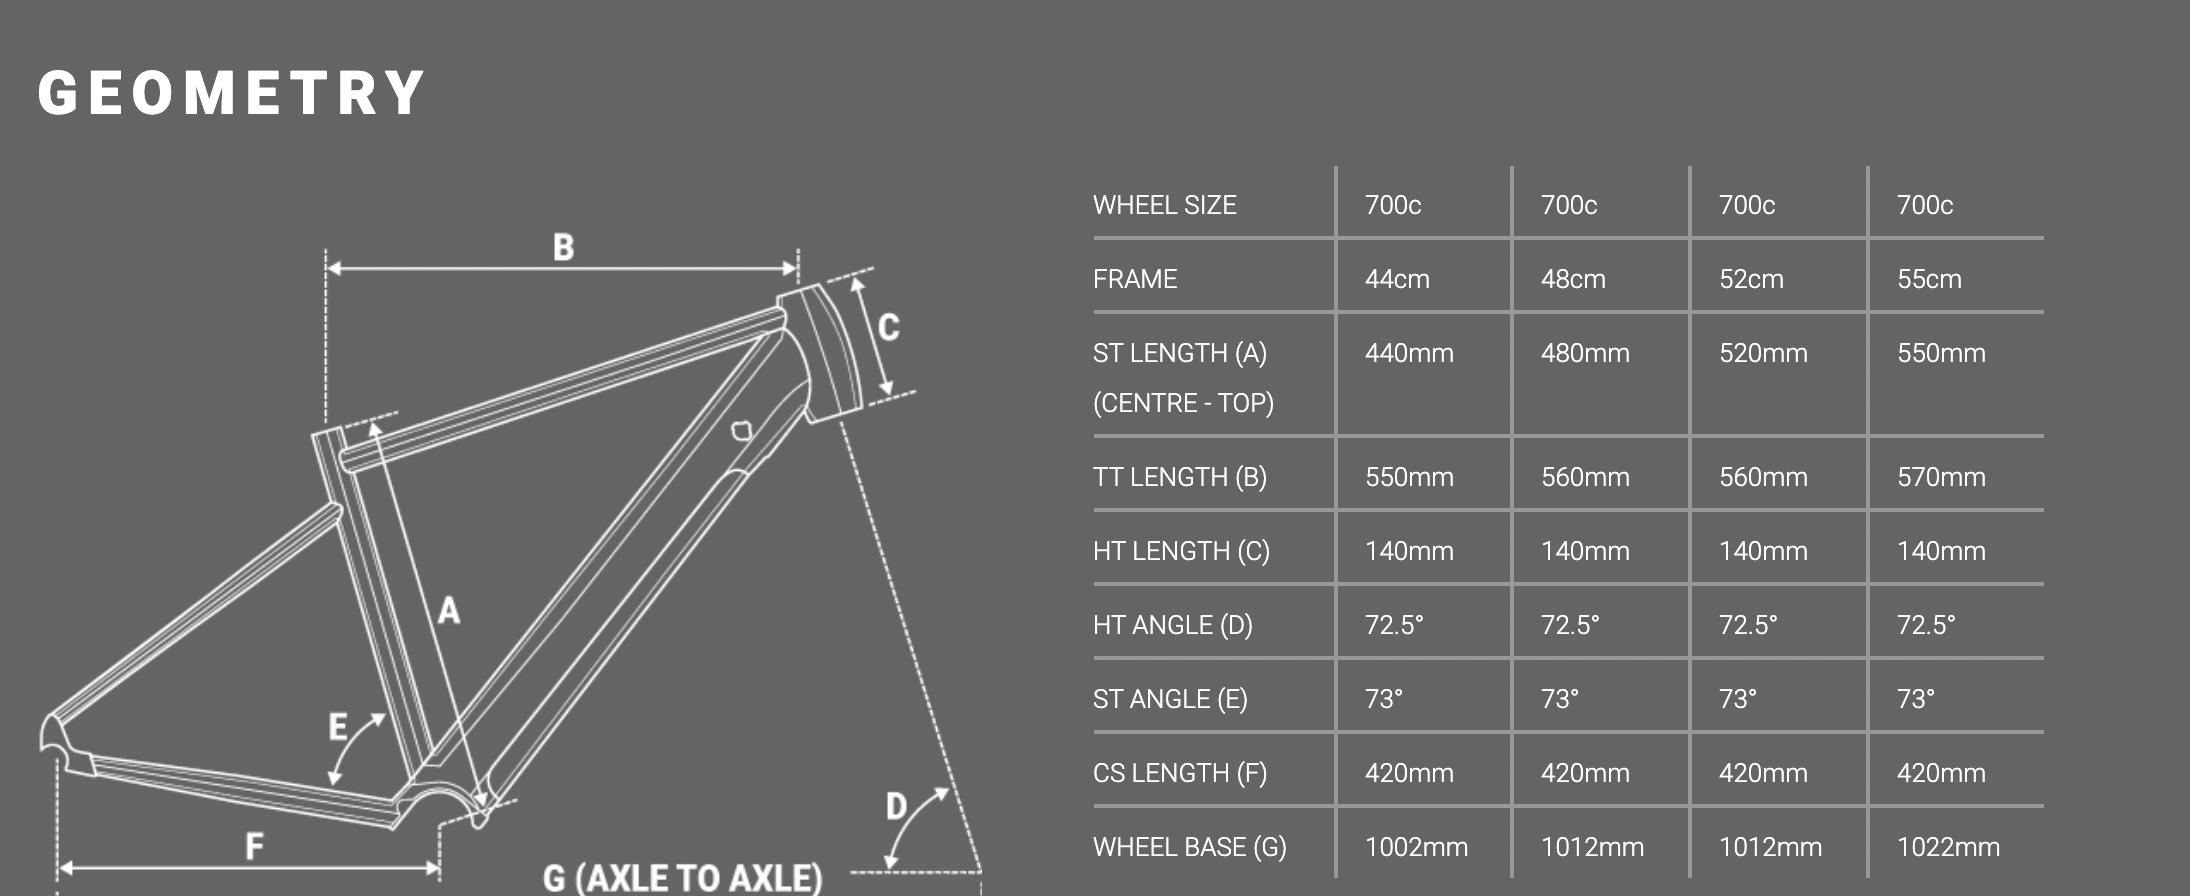 Forme Monyash Geometry Table